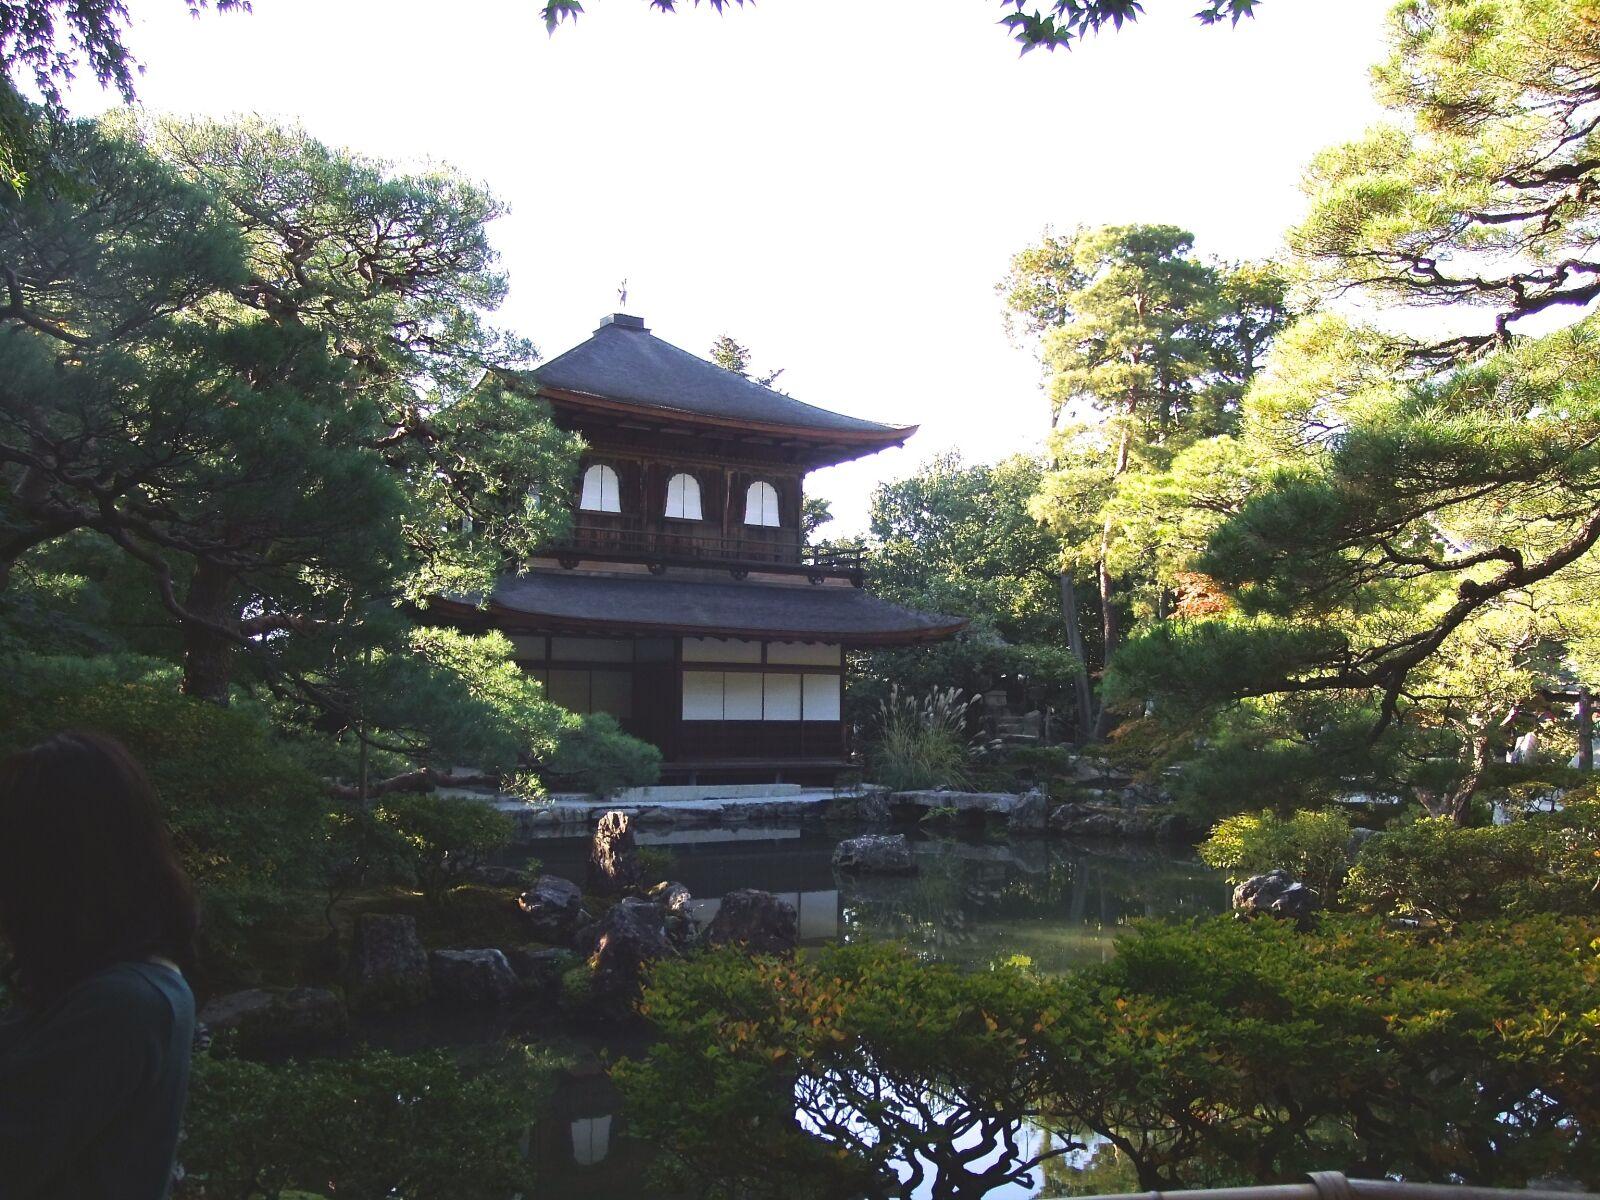 "FujiFilm FinePix JZ500 (FinePix JZ505) sample photo. ""Shrines, temples, japan"" photography"